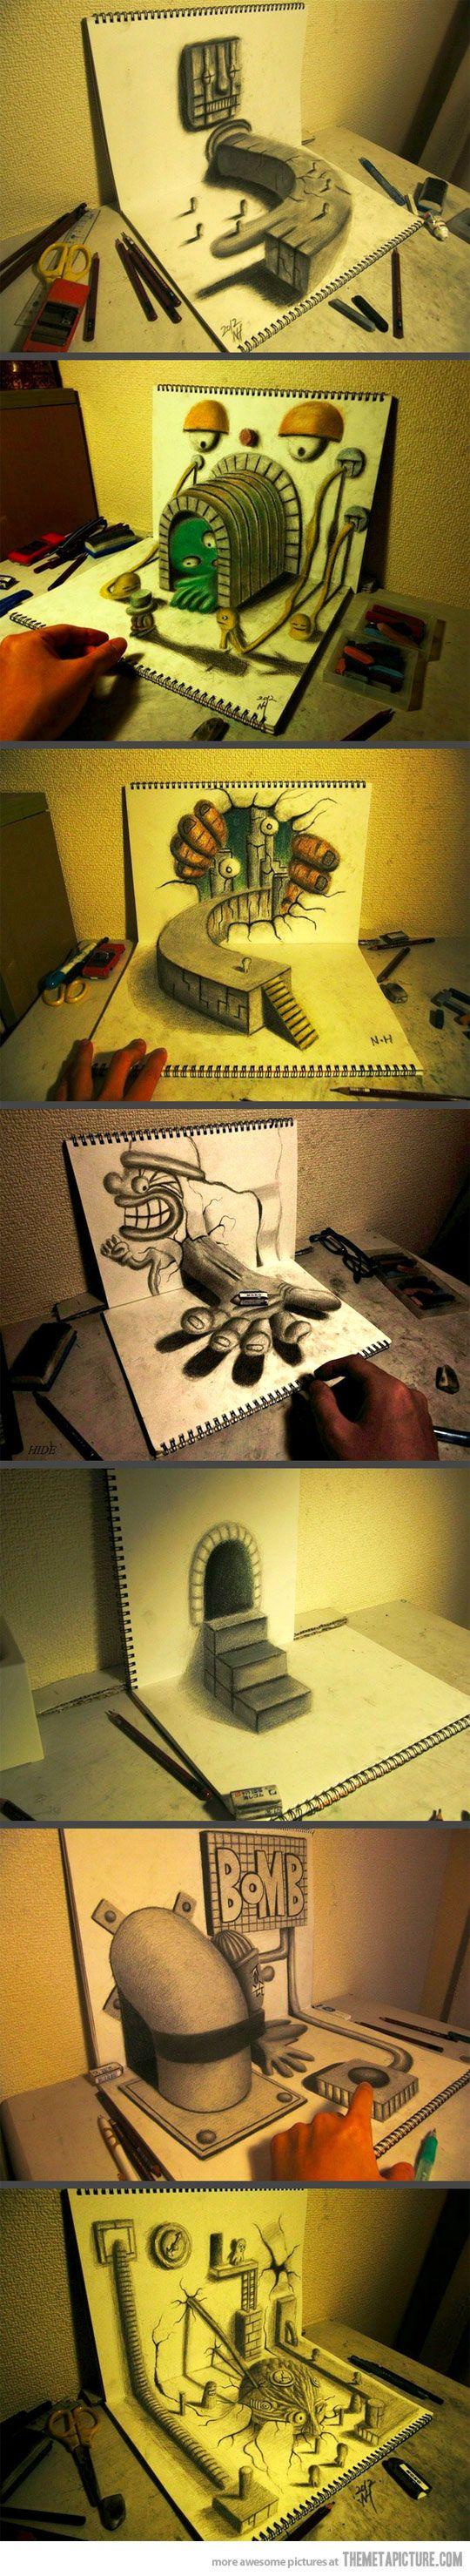 3D Illusion Sketchbook Drawings